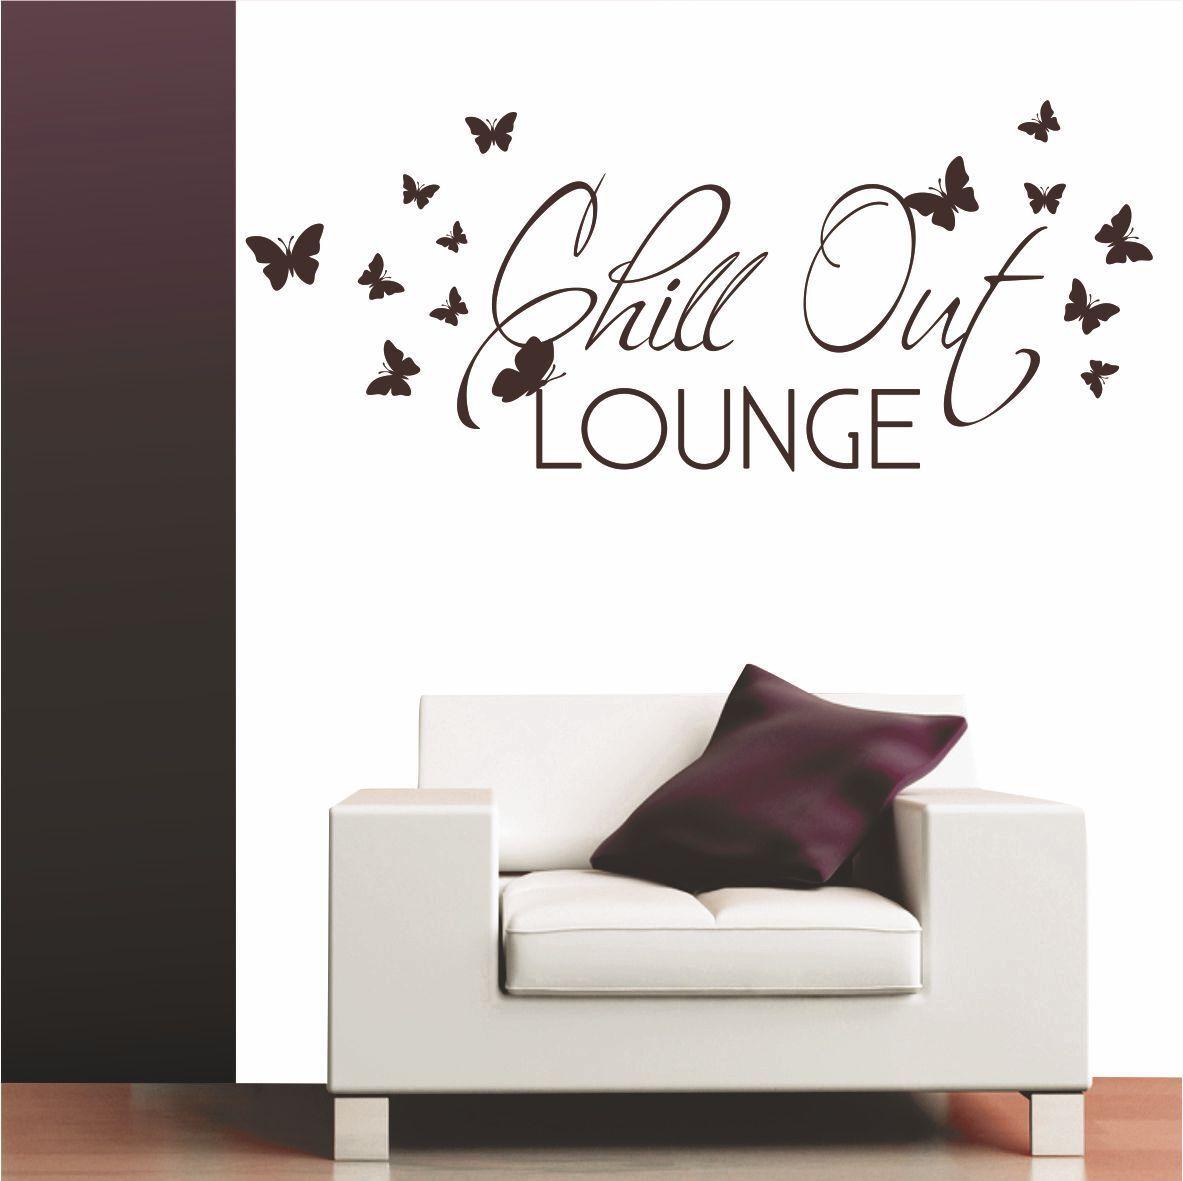 Fabelhaft Wandtattoo Schmetterling Foto Von Chill Out Lounge Wohnzimmer Büro Salon Wandaufkleber